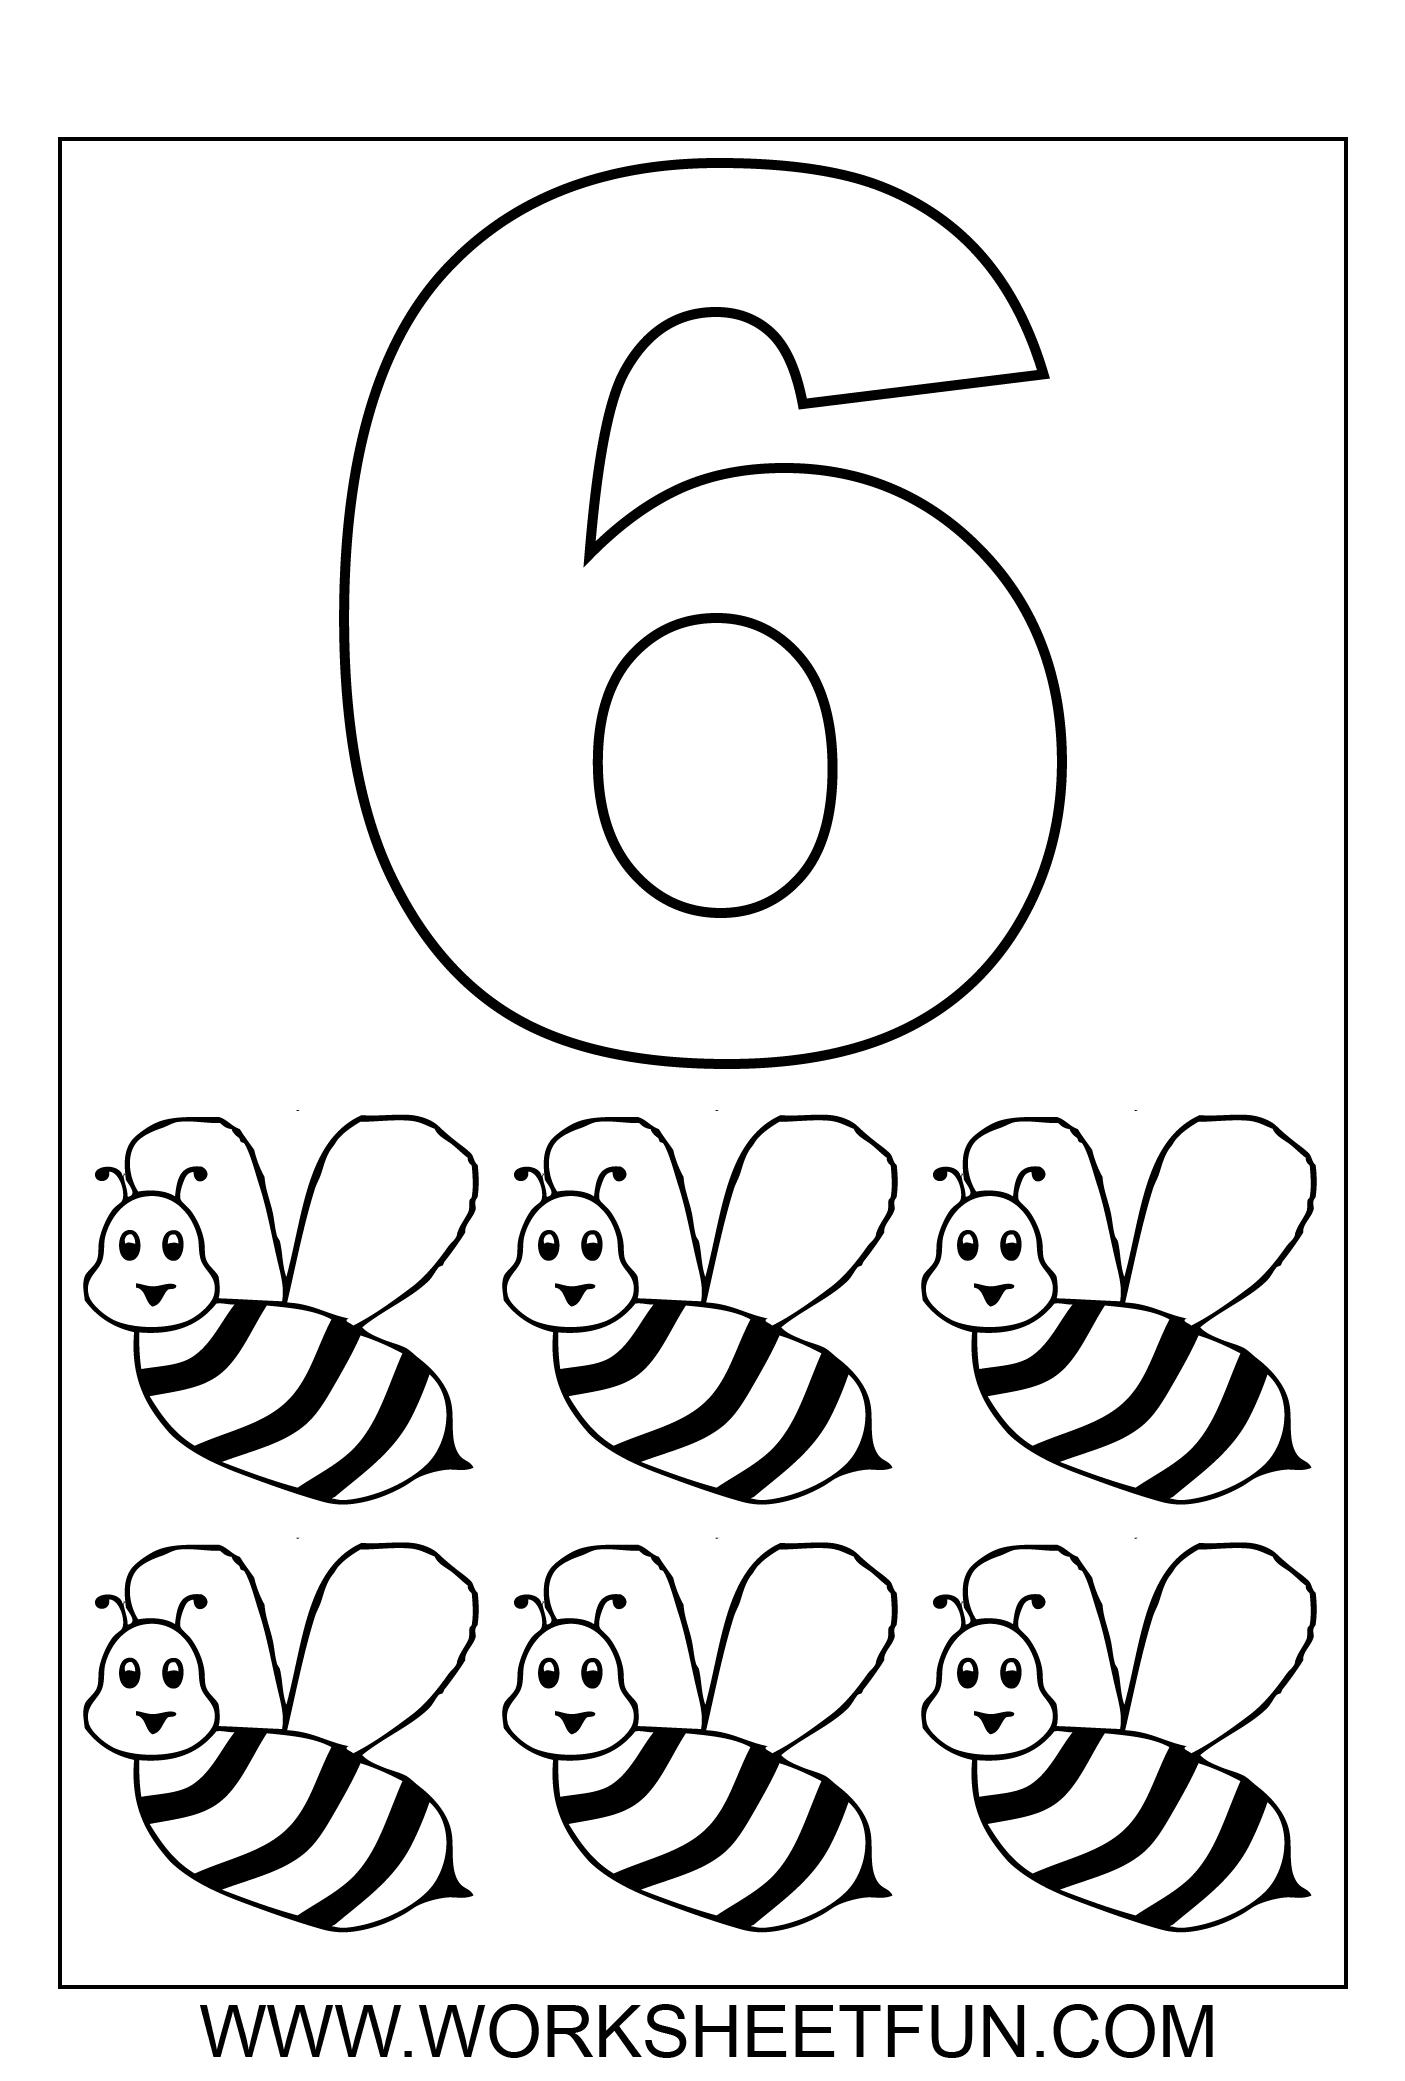 Pin on Printable Worksheets